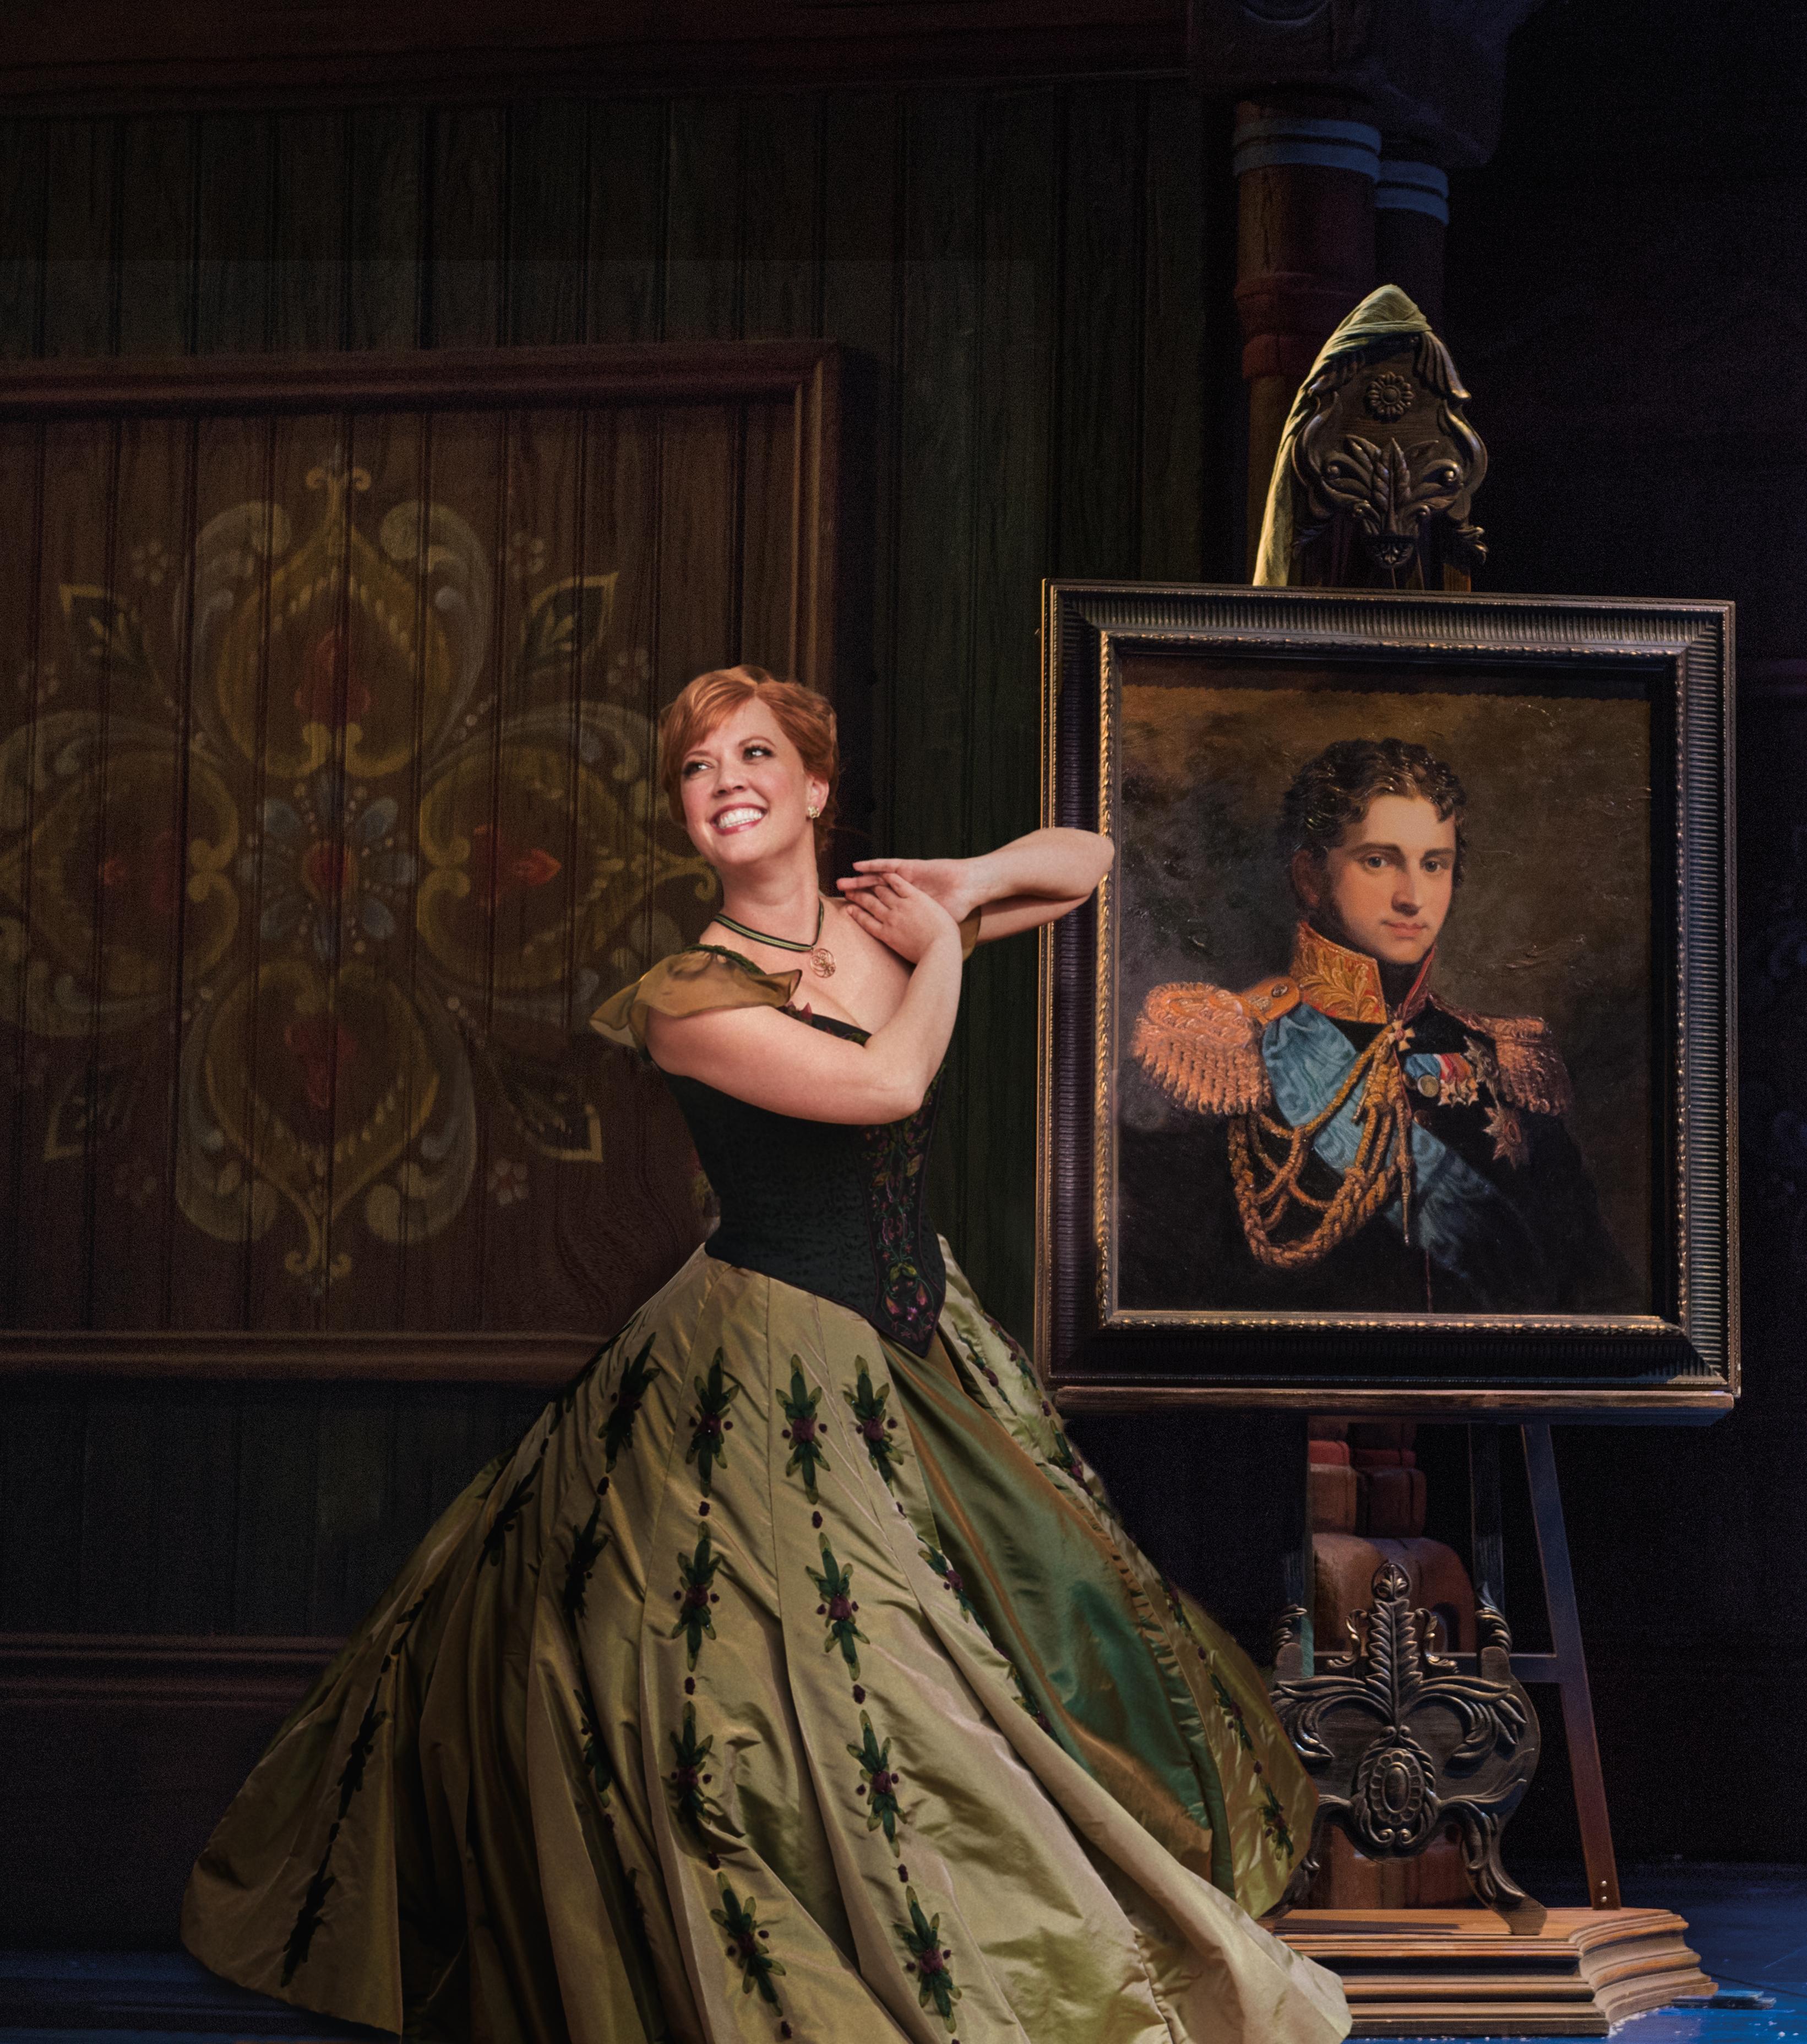 Patti-Murin-as-Anna-in-FROZEN-on-Broadway-Portrait.-Photo-by-Deen-van-Meer.jpg